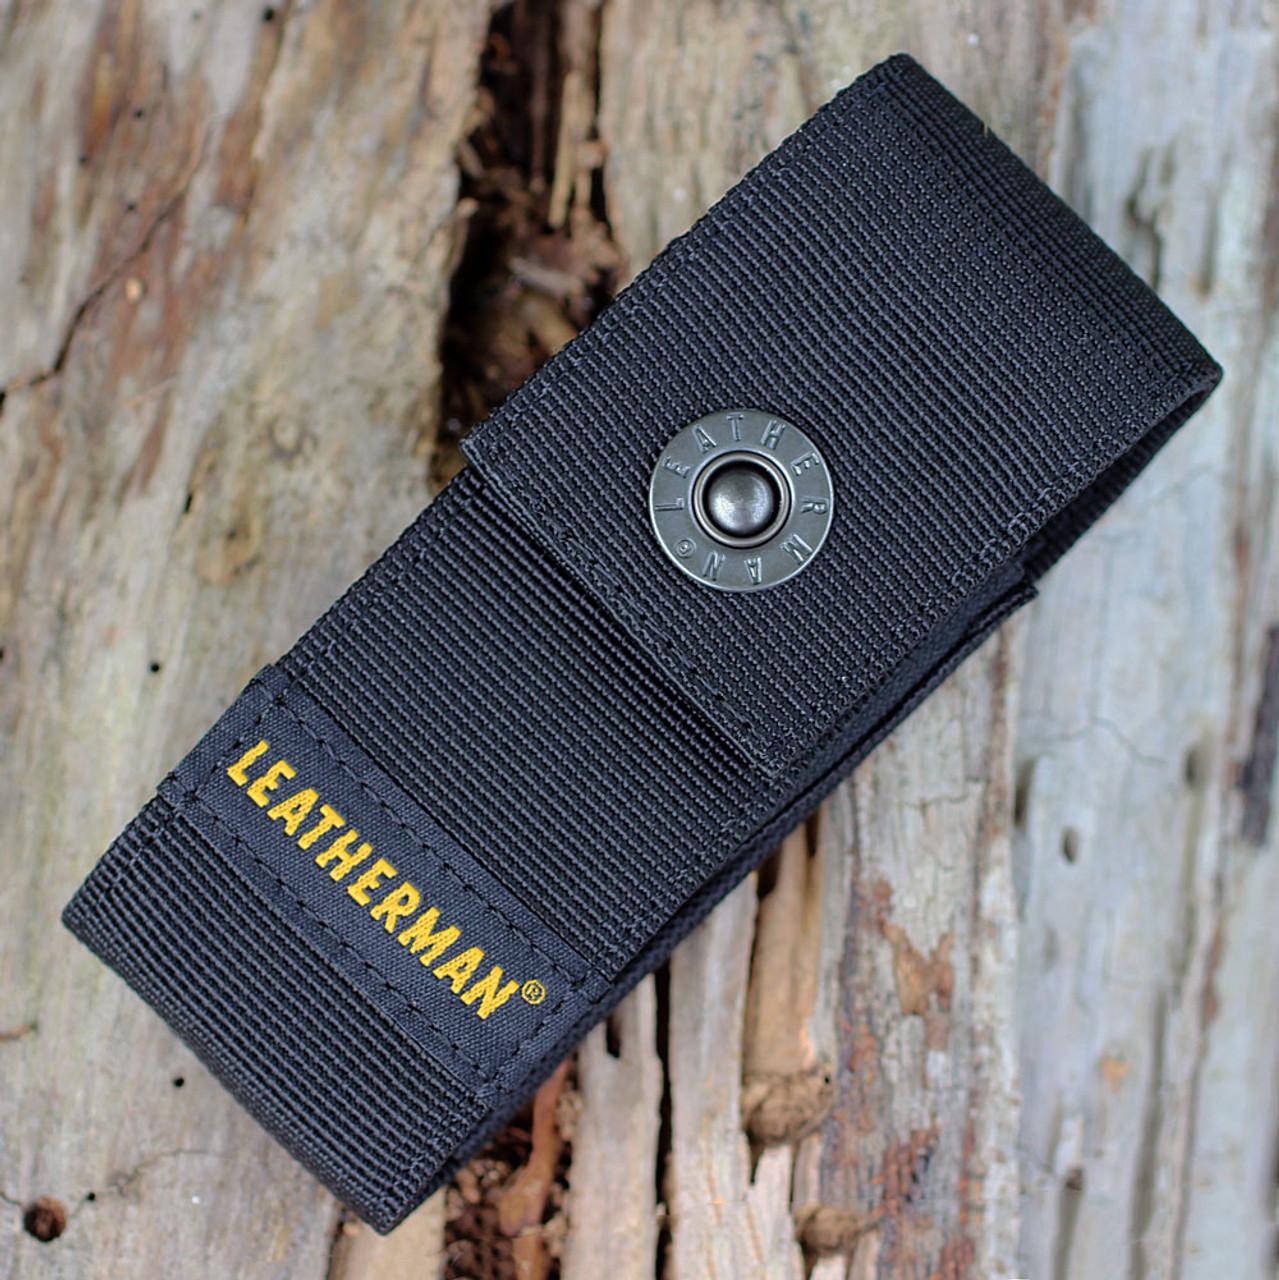 "Leatherman Black Nylon Sheath Medium (4.25"" x 1.5"" x 0.8"") - 934928"